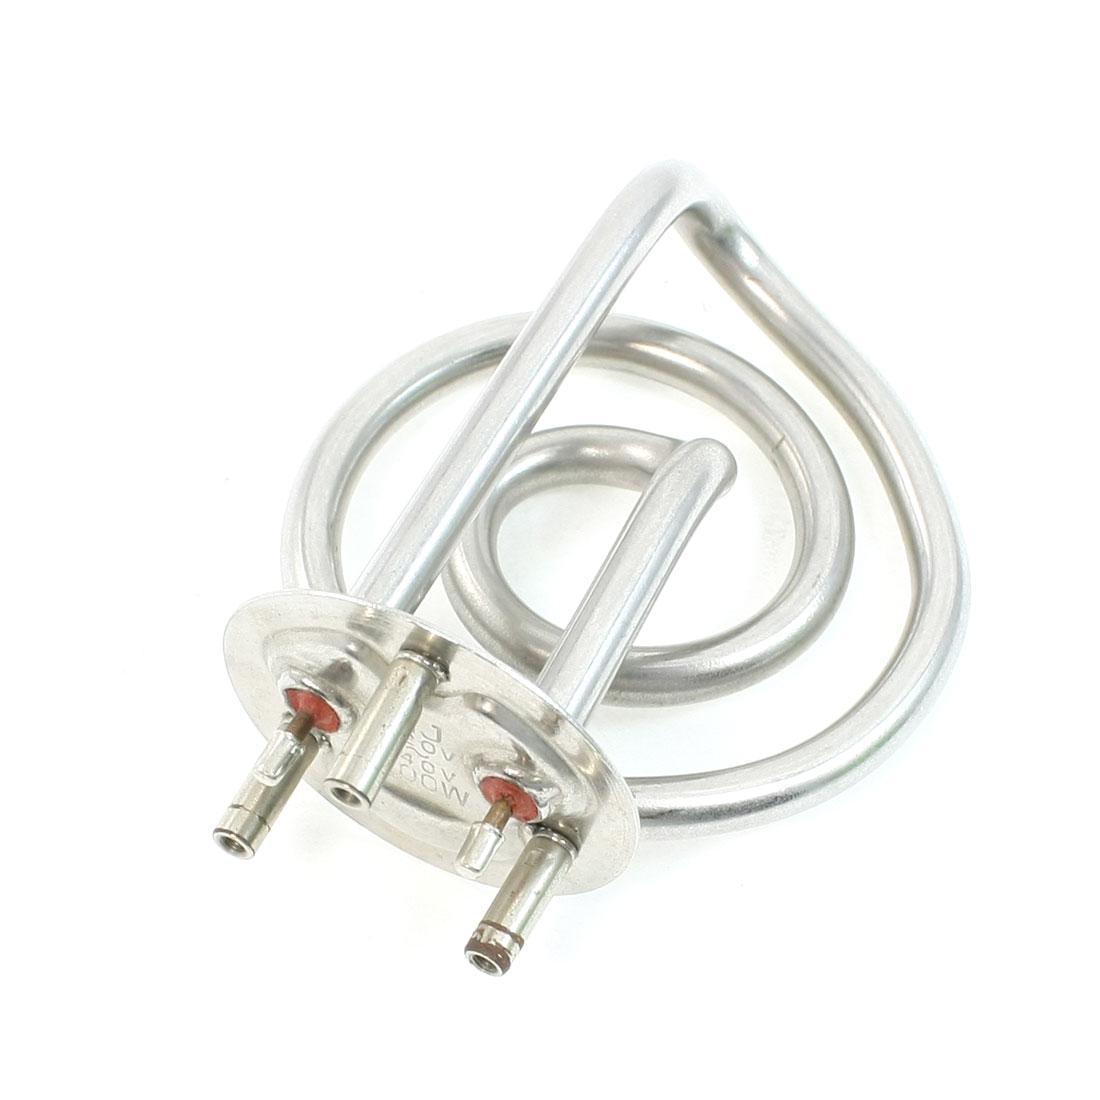 7.5cm Dia Bundle Electric Tubular Water Heater Element 220V/240V 1200W